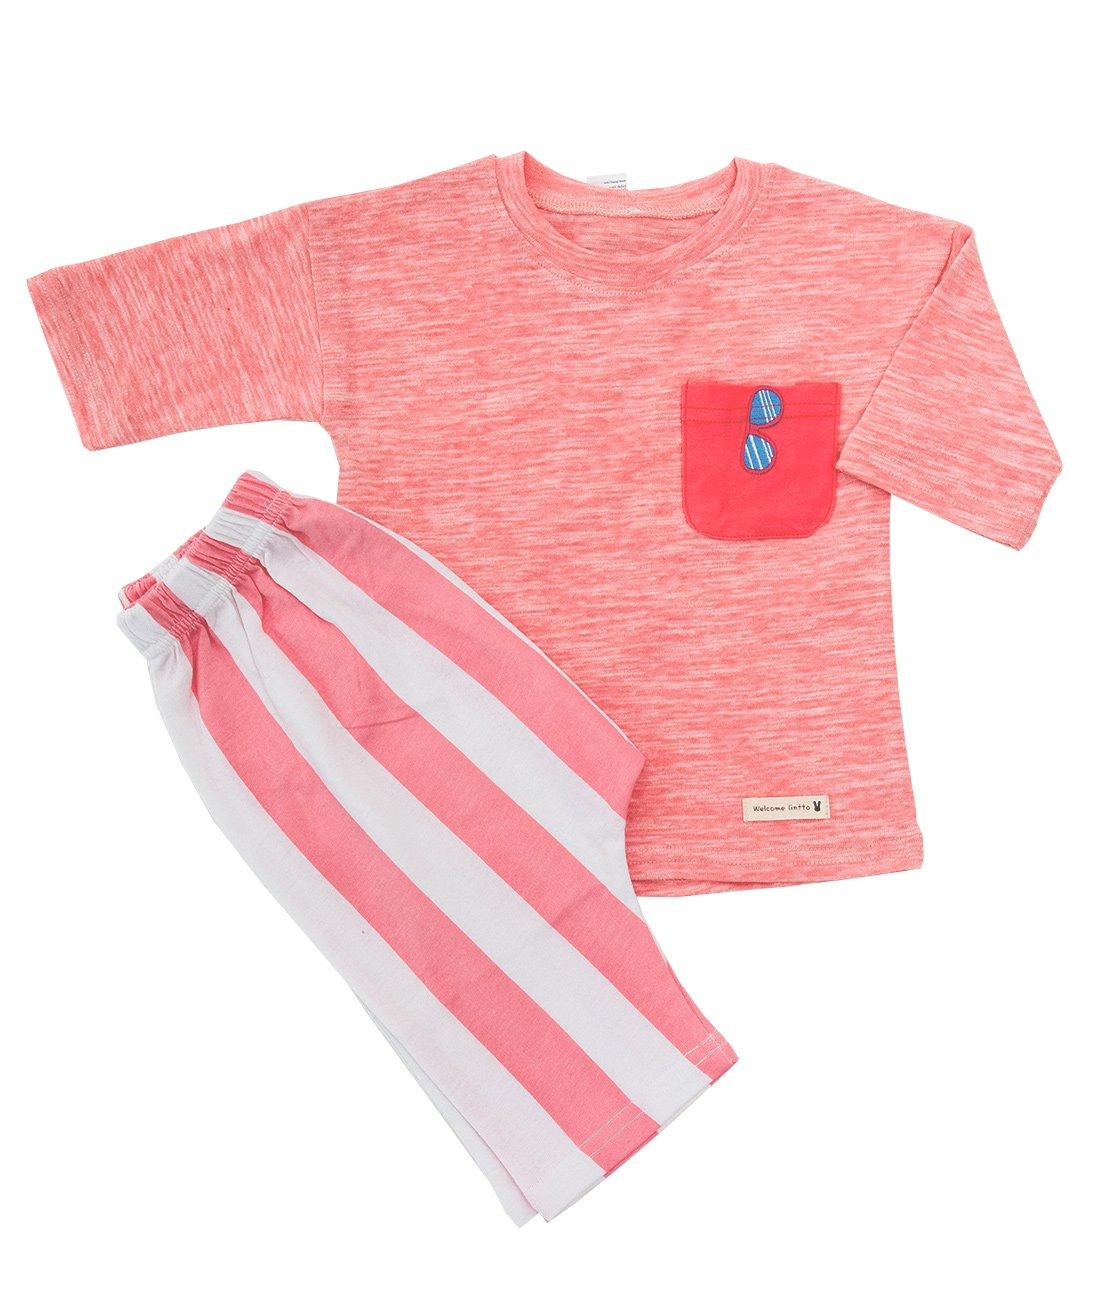 Lintto Pocket Sunglasses Embroidery Girls 2 Piece 3/4 Sleeves Pajama Set Cotton 100% Kids PJS Sleepwear (140(8T-9T))